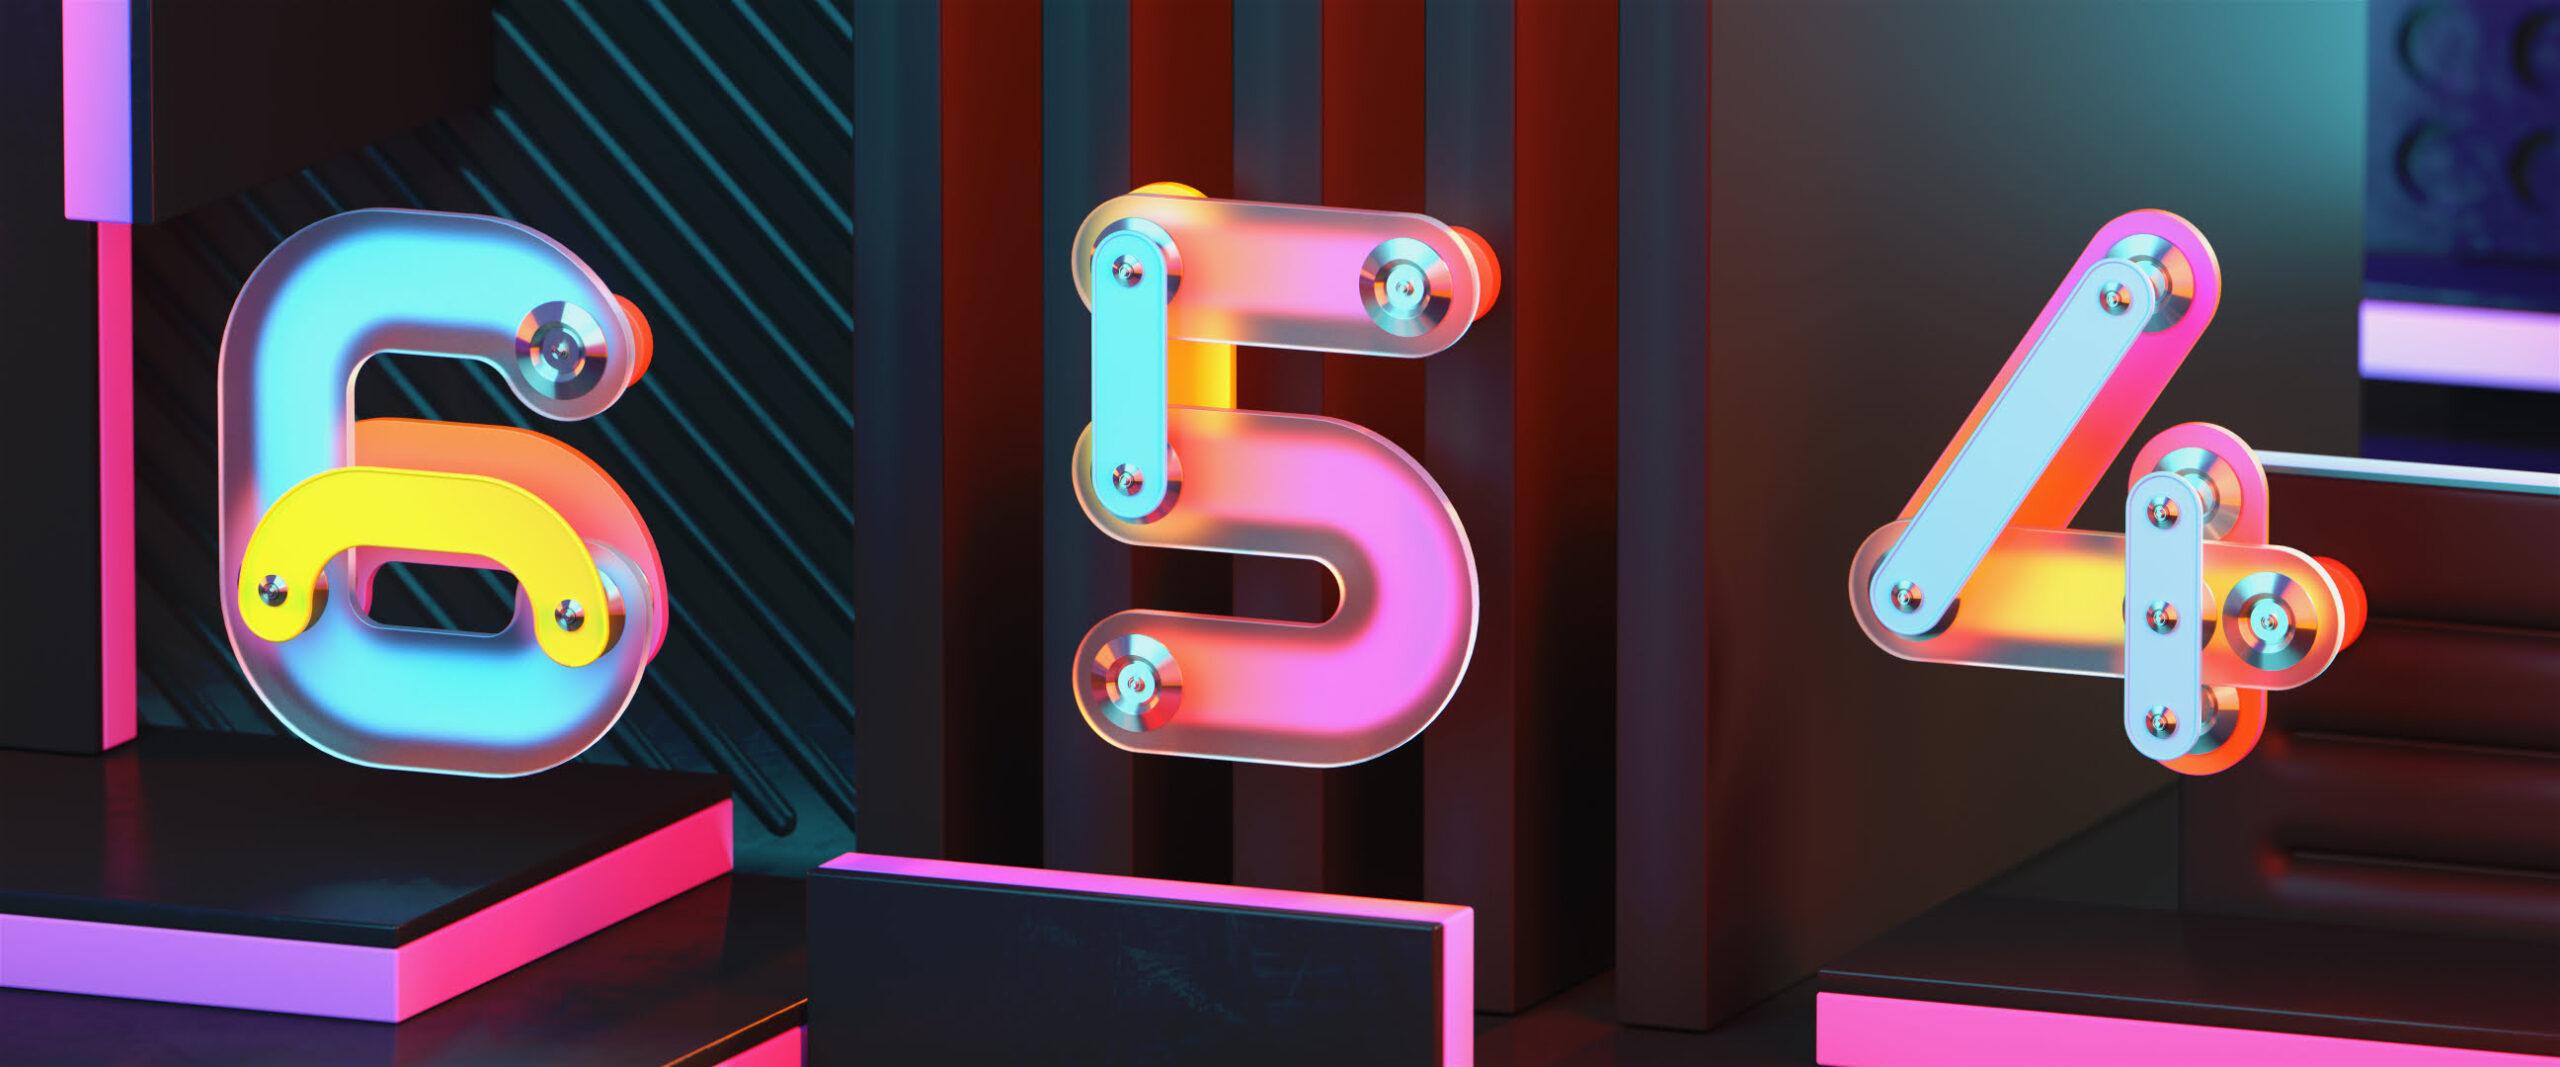 36DOT-11